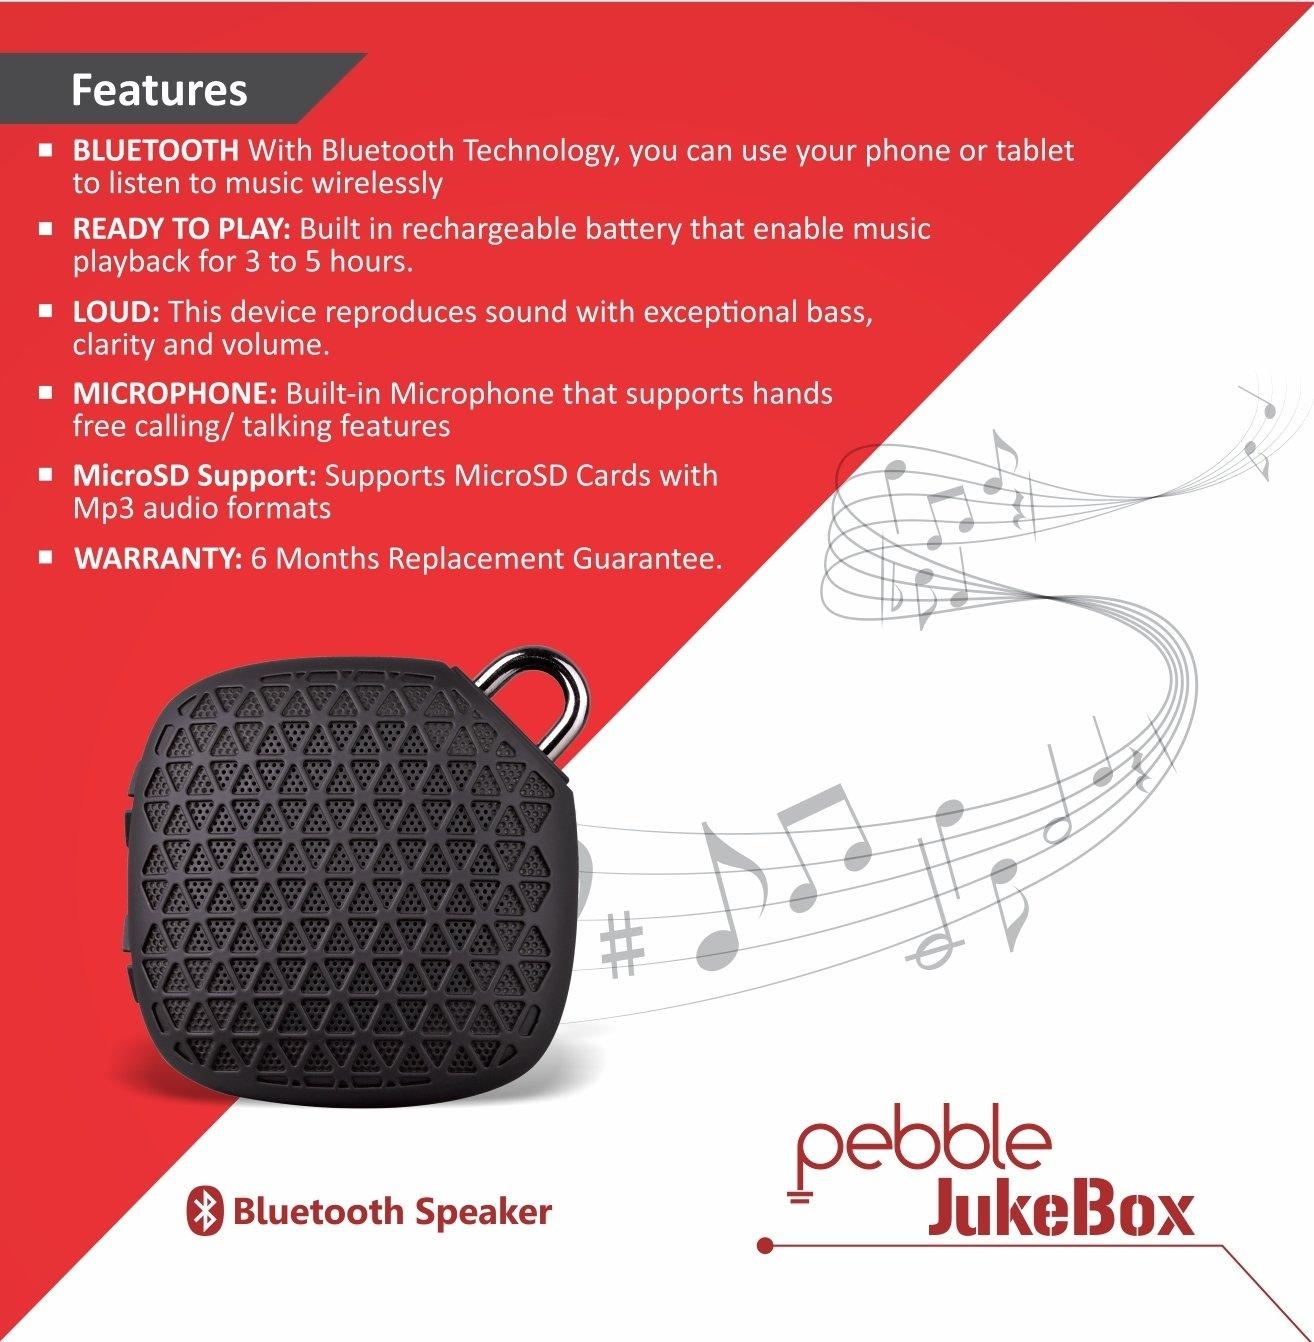 Wurlitzer Microphone Wiring Diagram Library Of Diagrams Uniden Mic Jukebox Speaker Explained Rh Dmdelectro Co Radio Shack